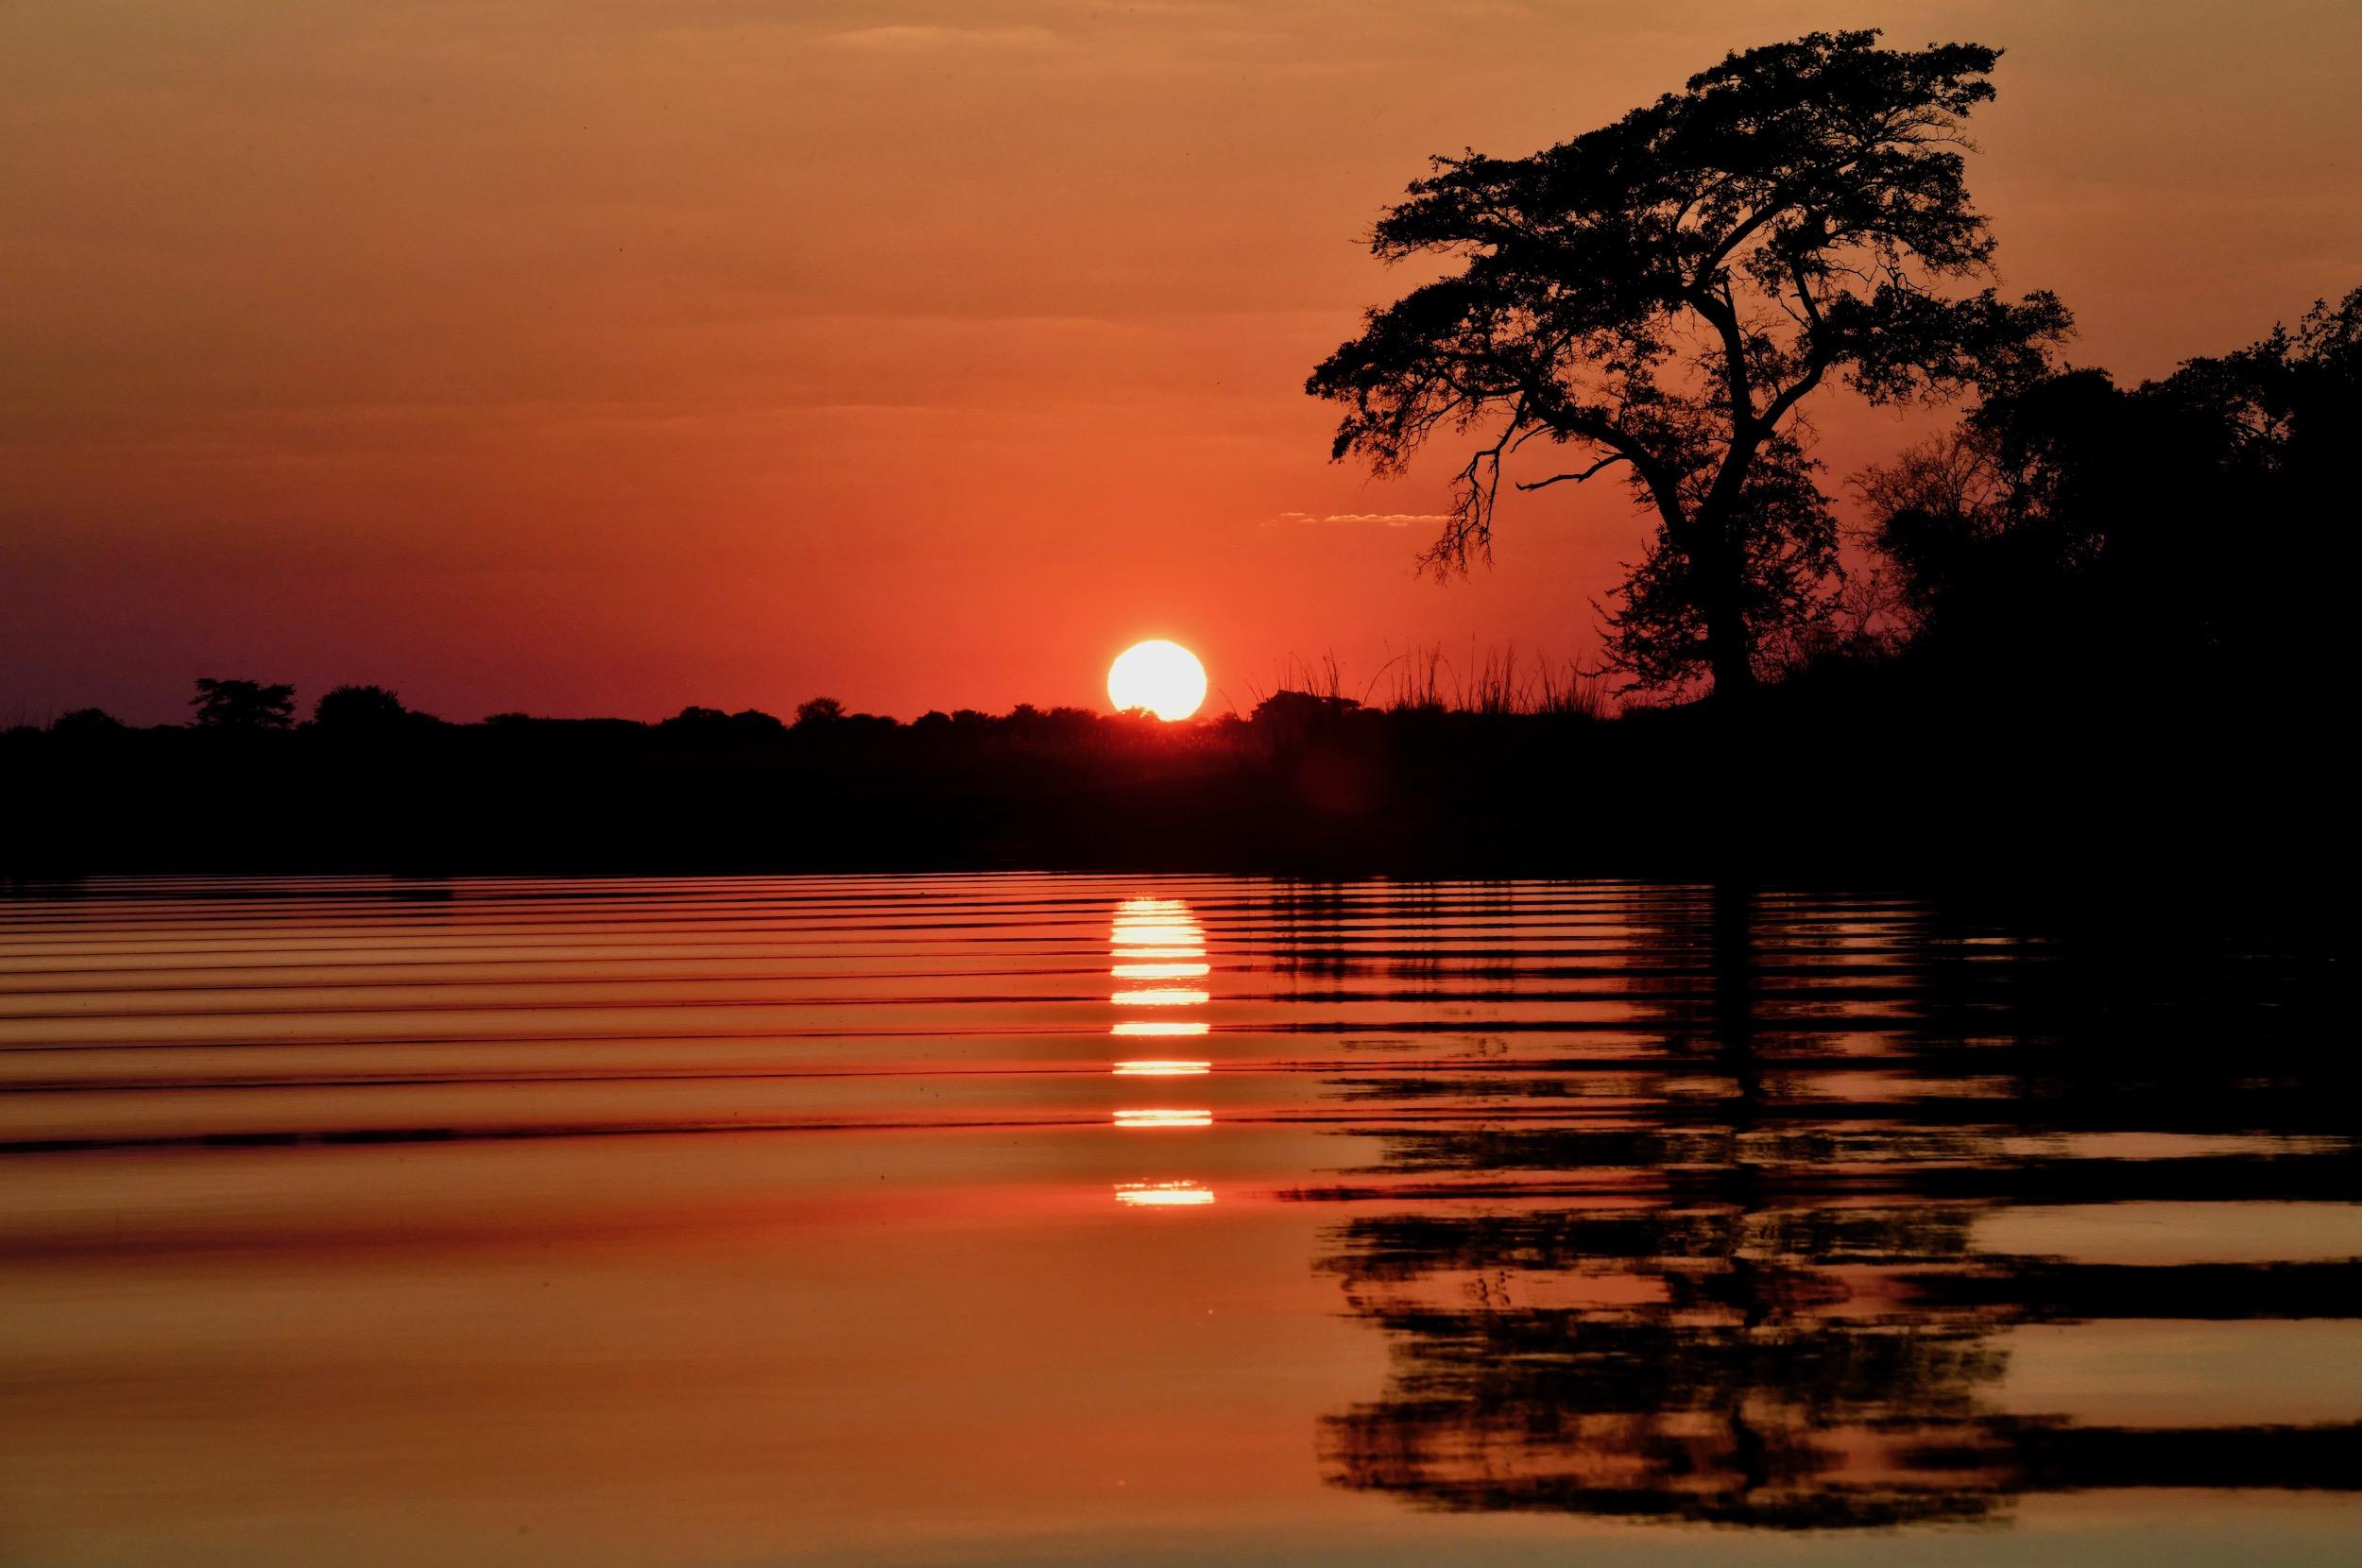 Sonnenuntergang am Okavango